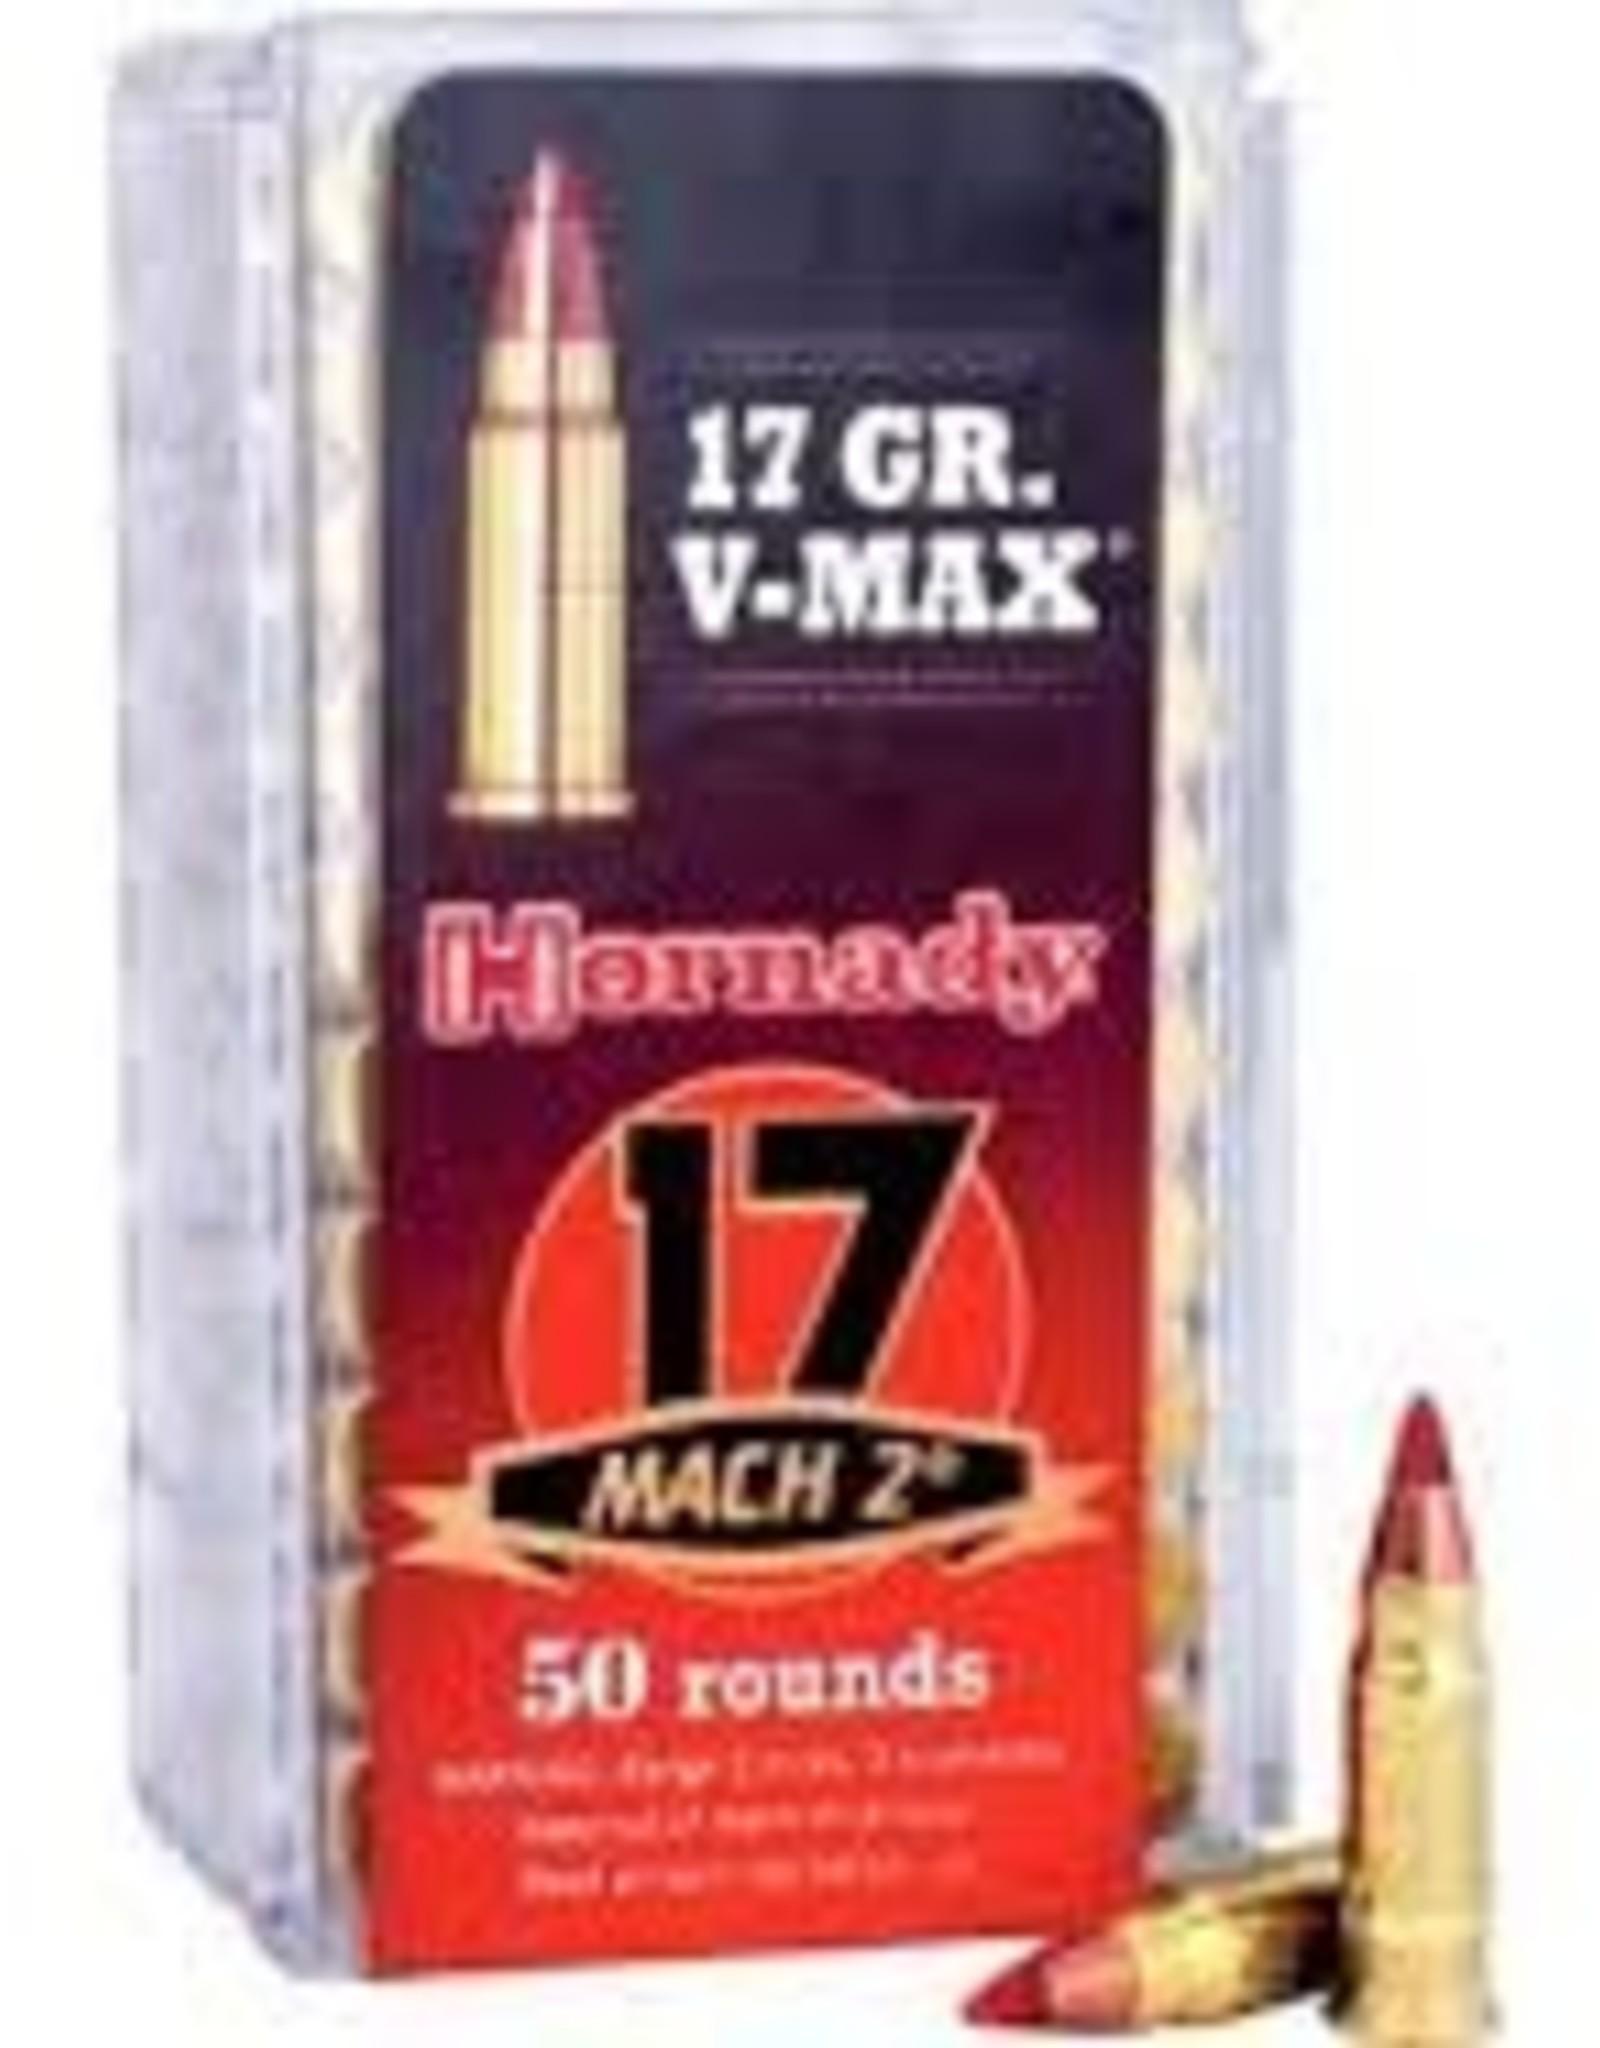 Hornady 17 GR V-MAX 17 MACH 2